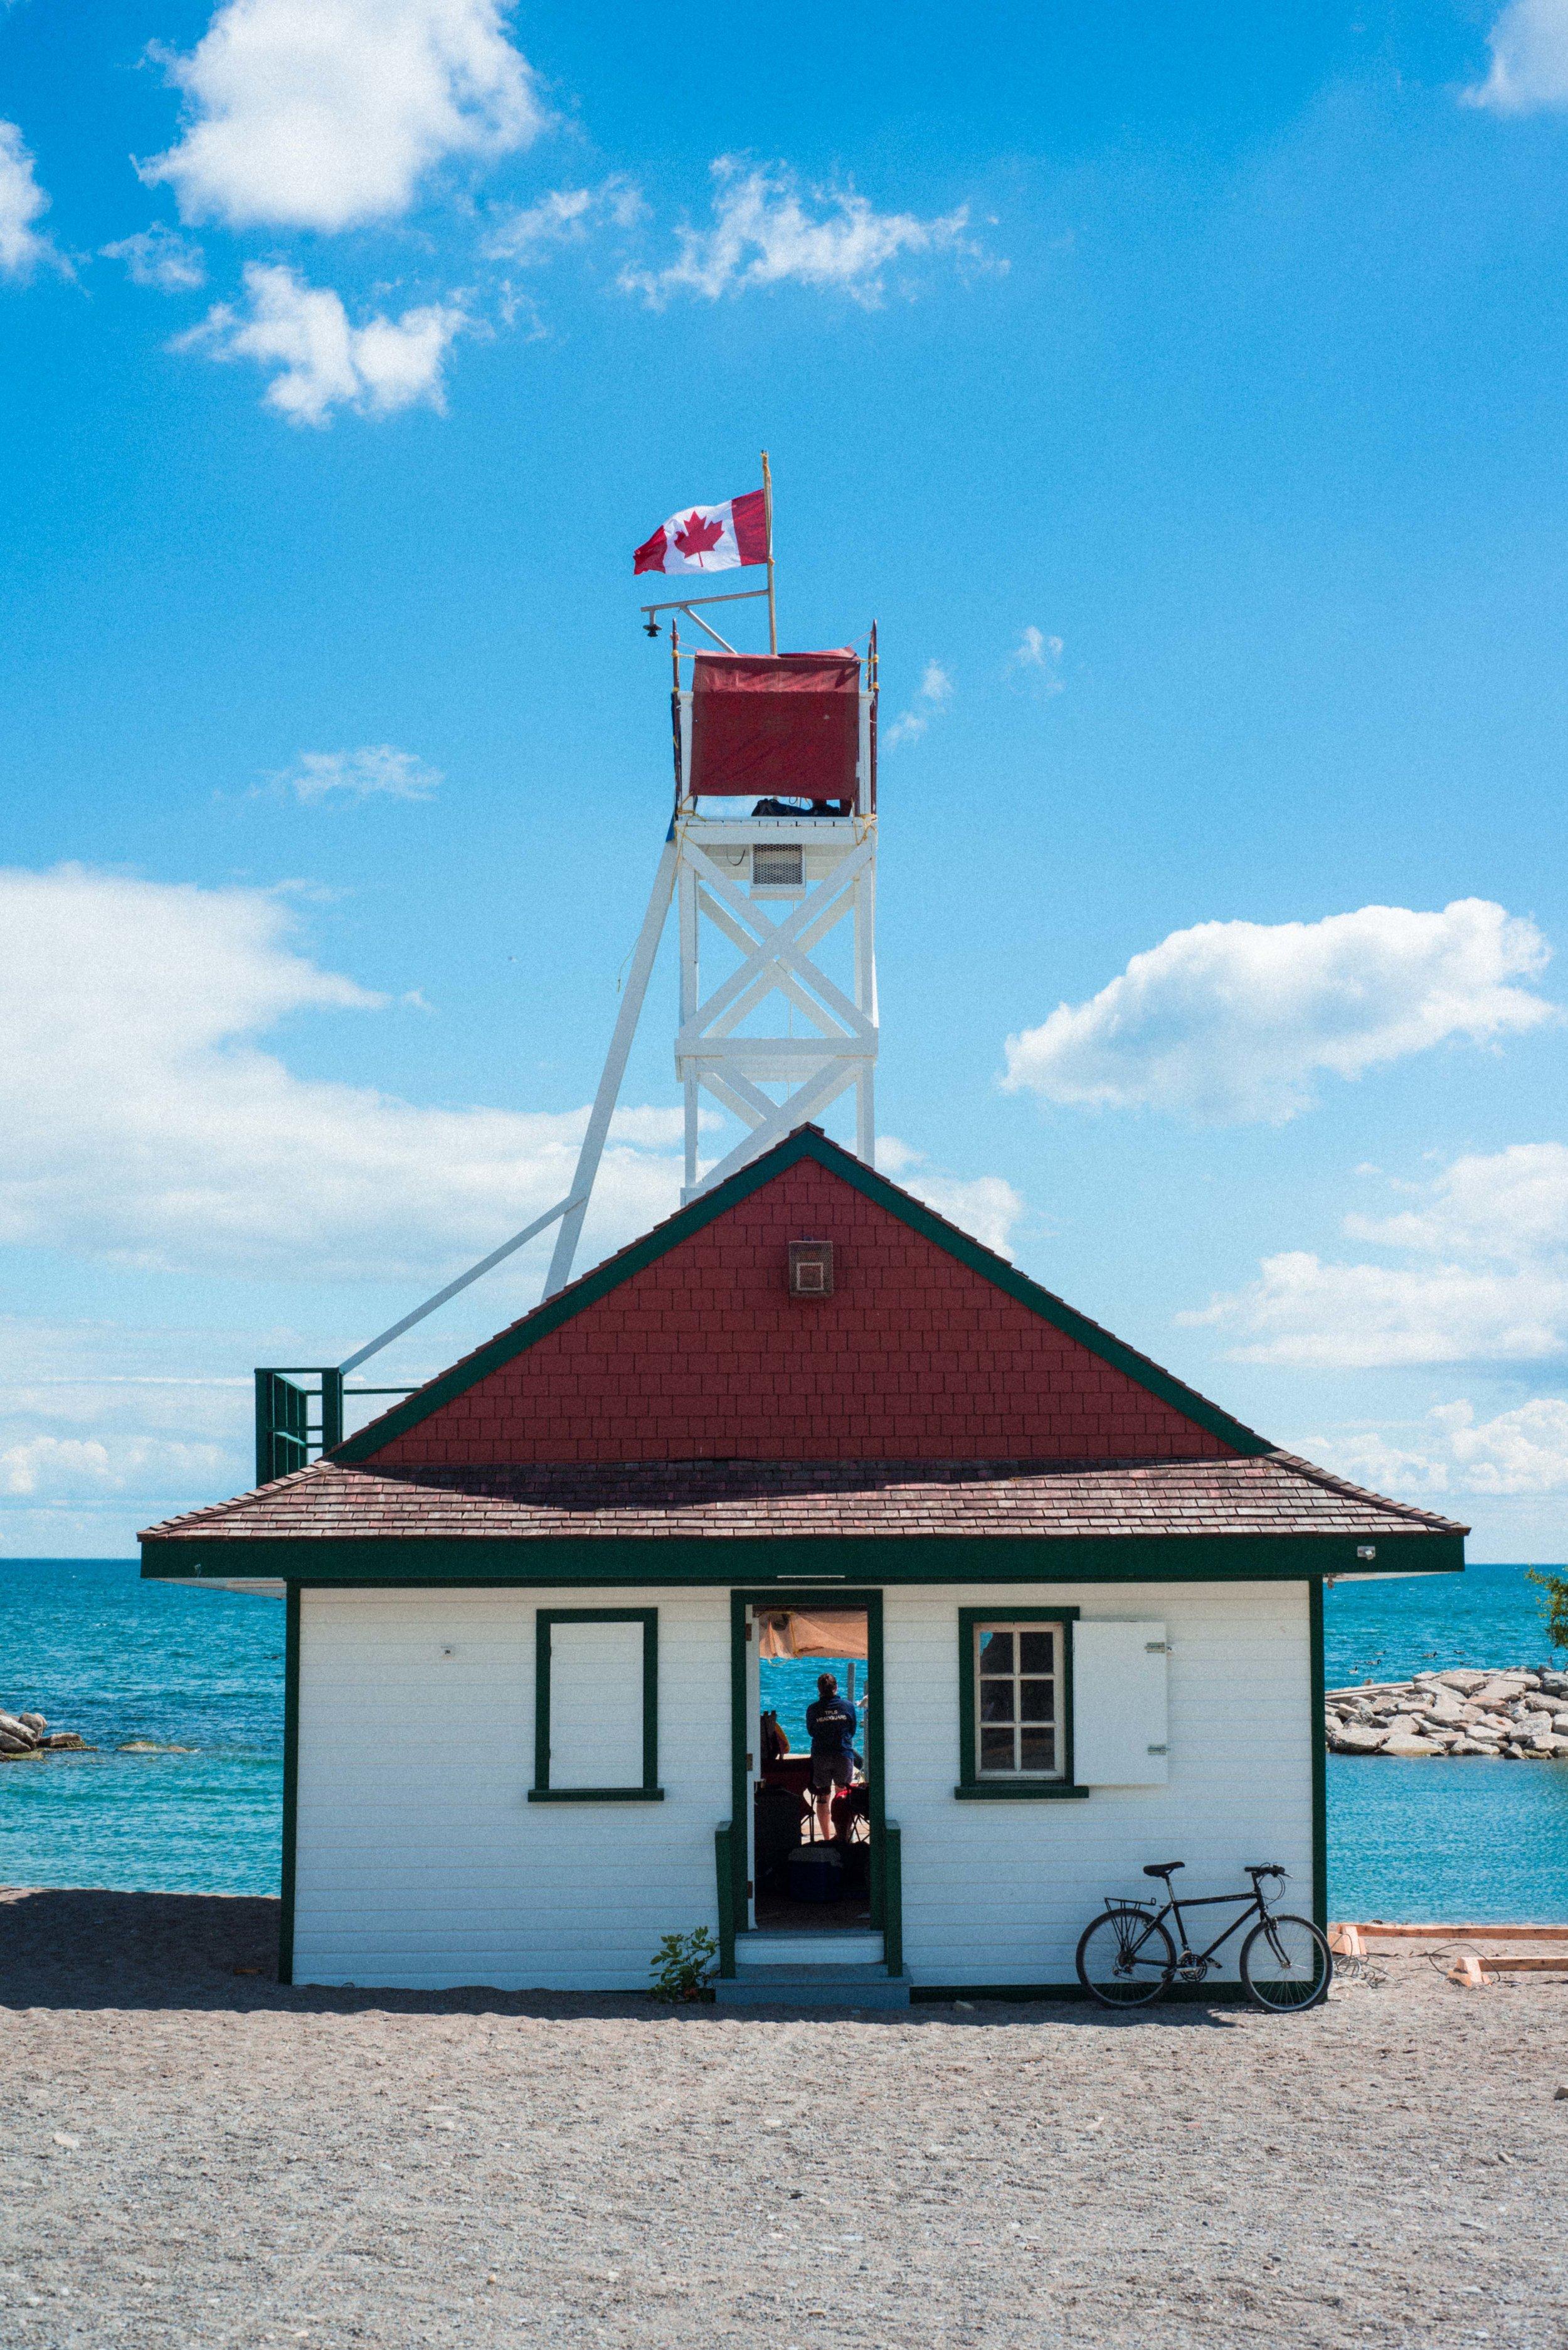 ryan thompson creative photography - beaches tower